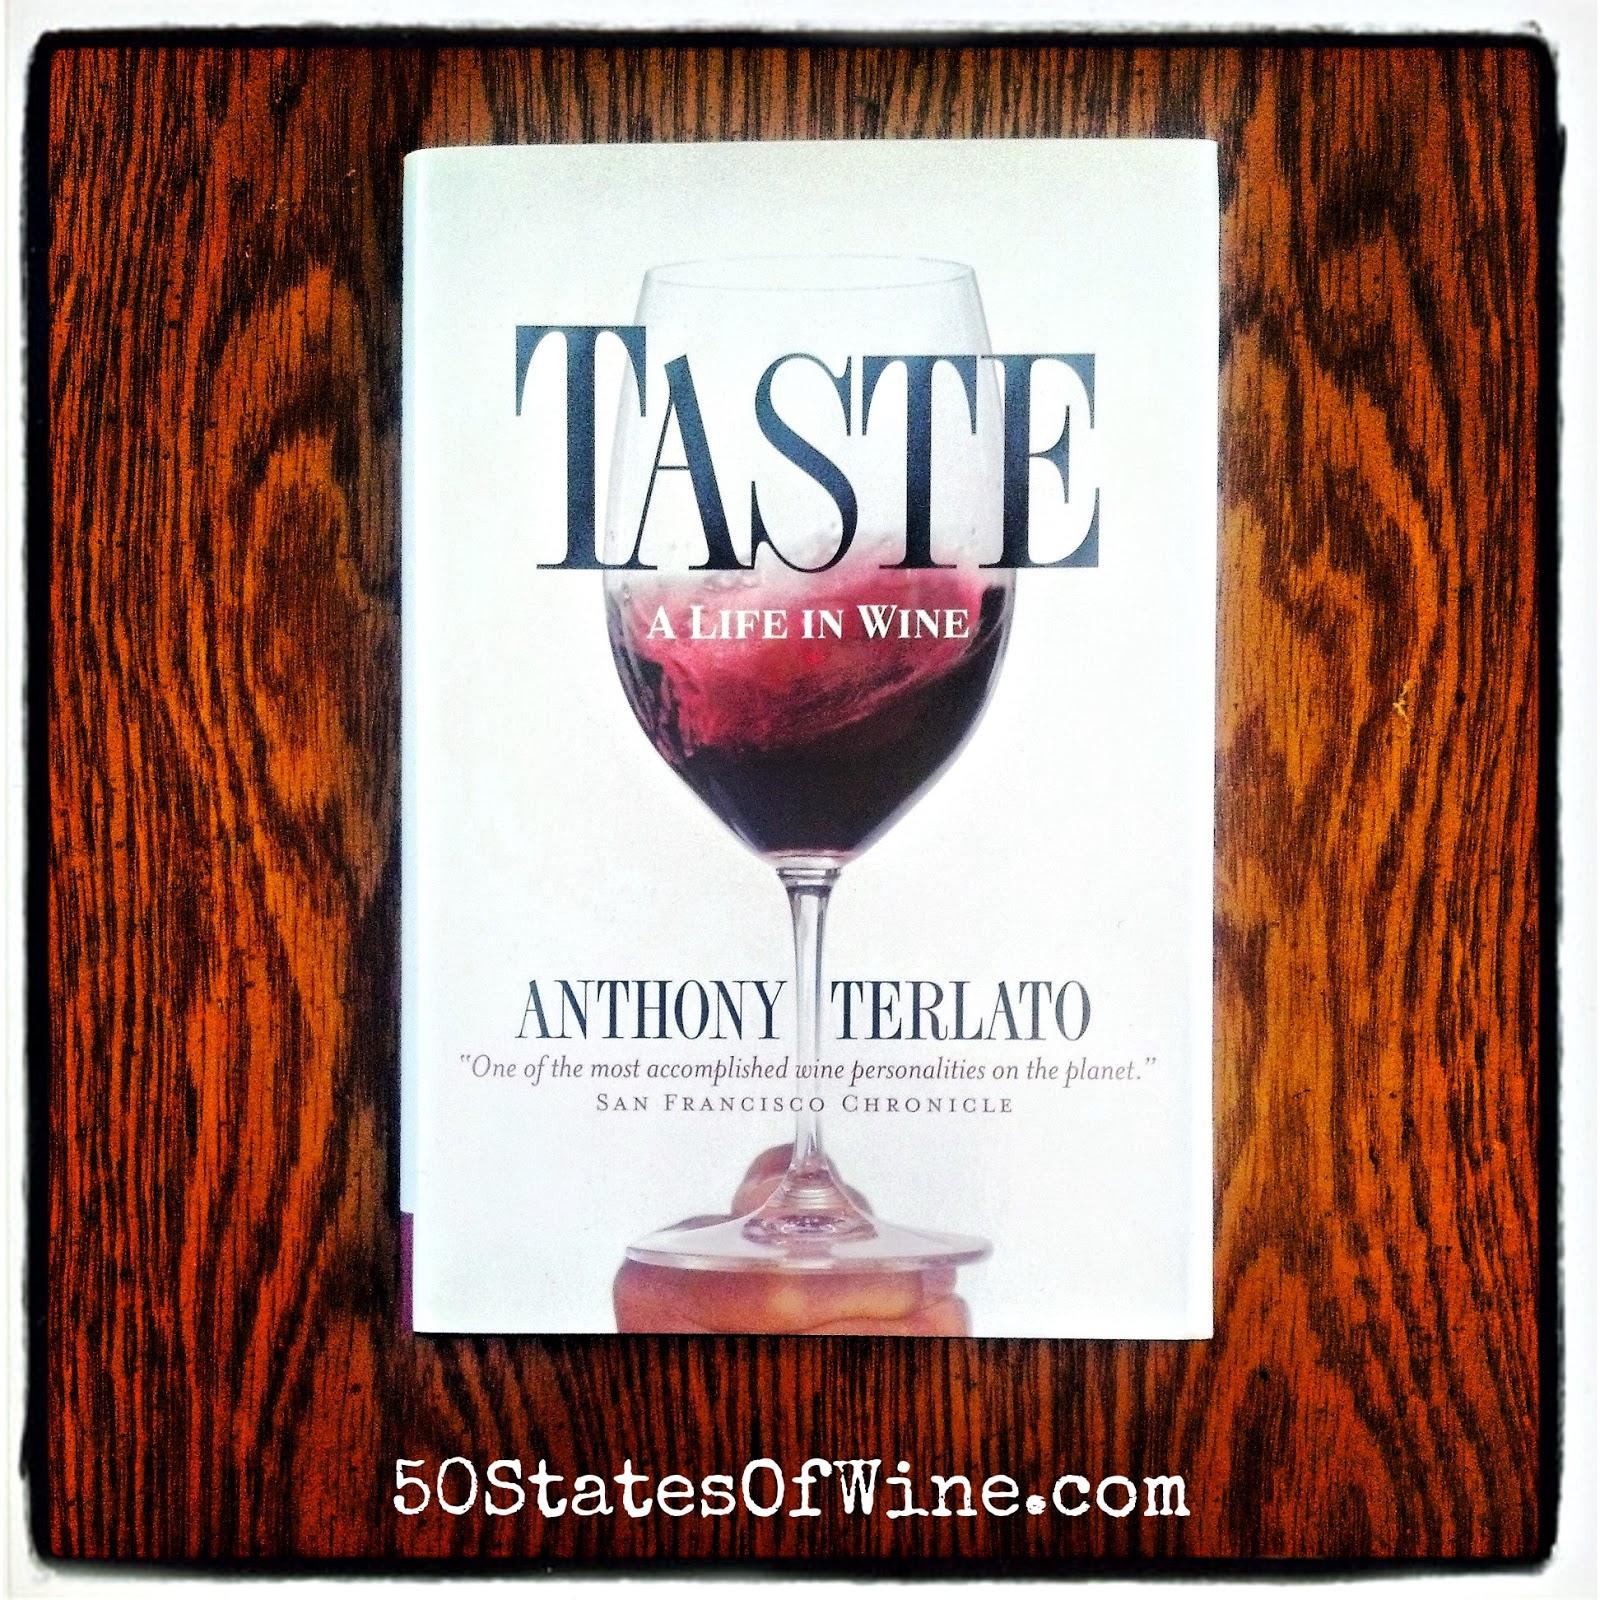 Taste: A Life in Wine